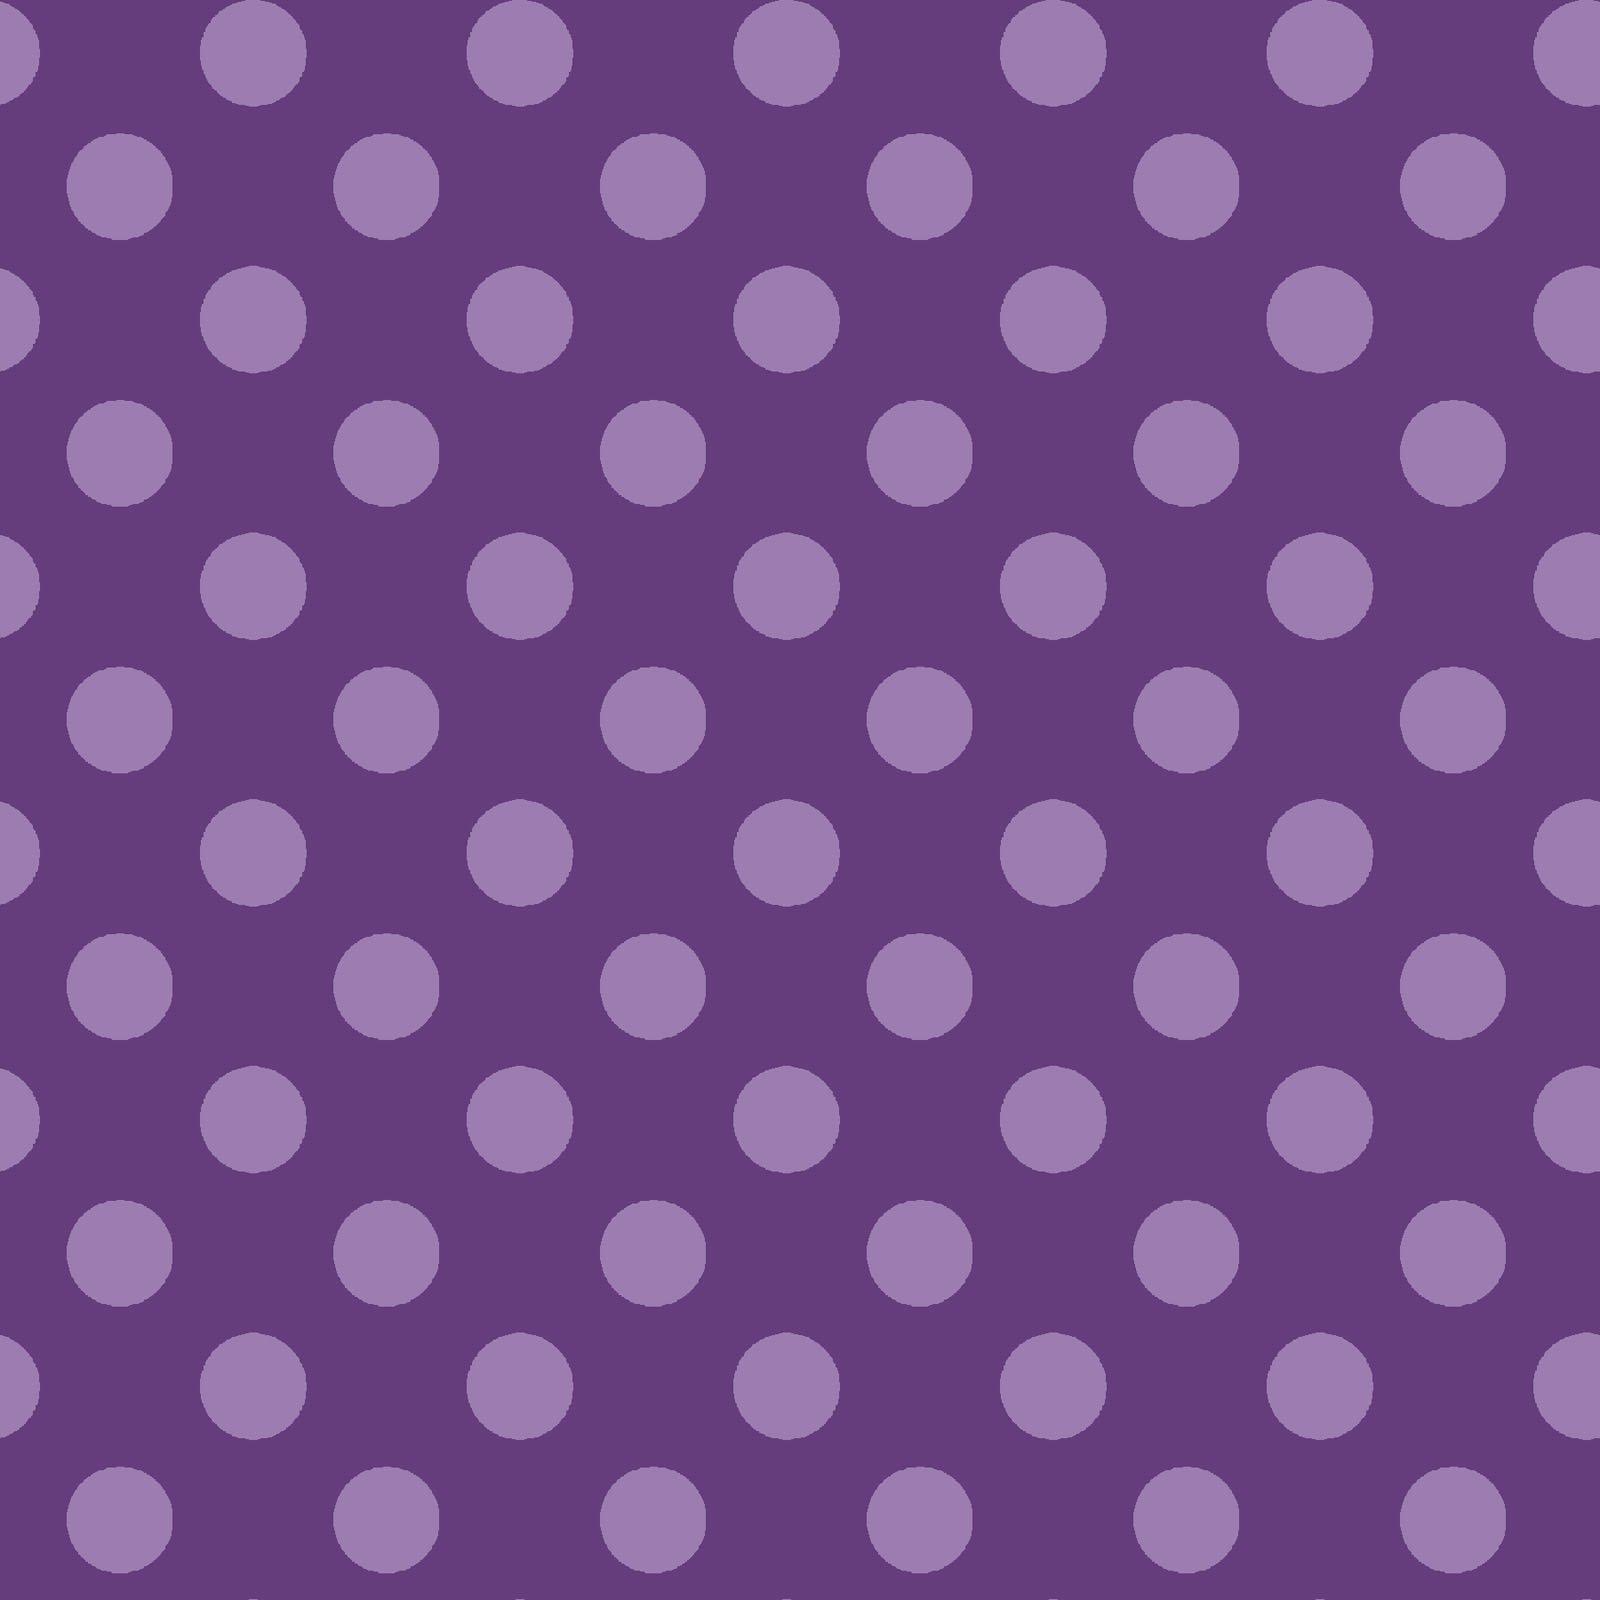 KimberBell Basics Violet Dots 8216M-VV